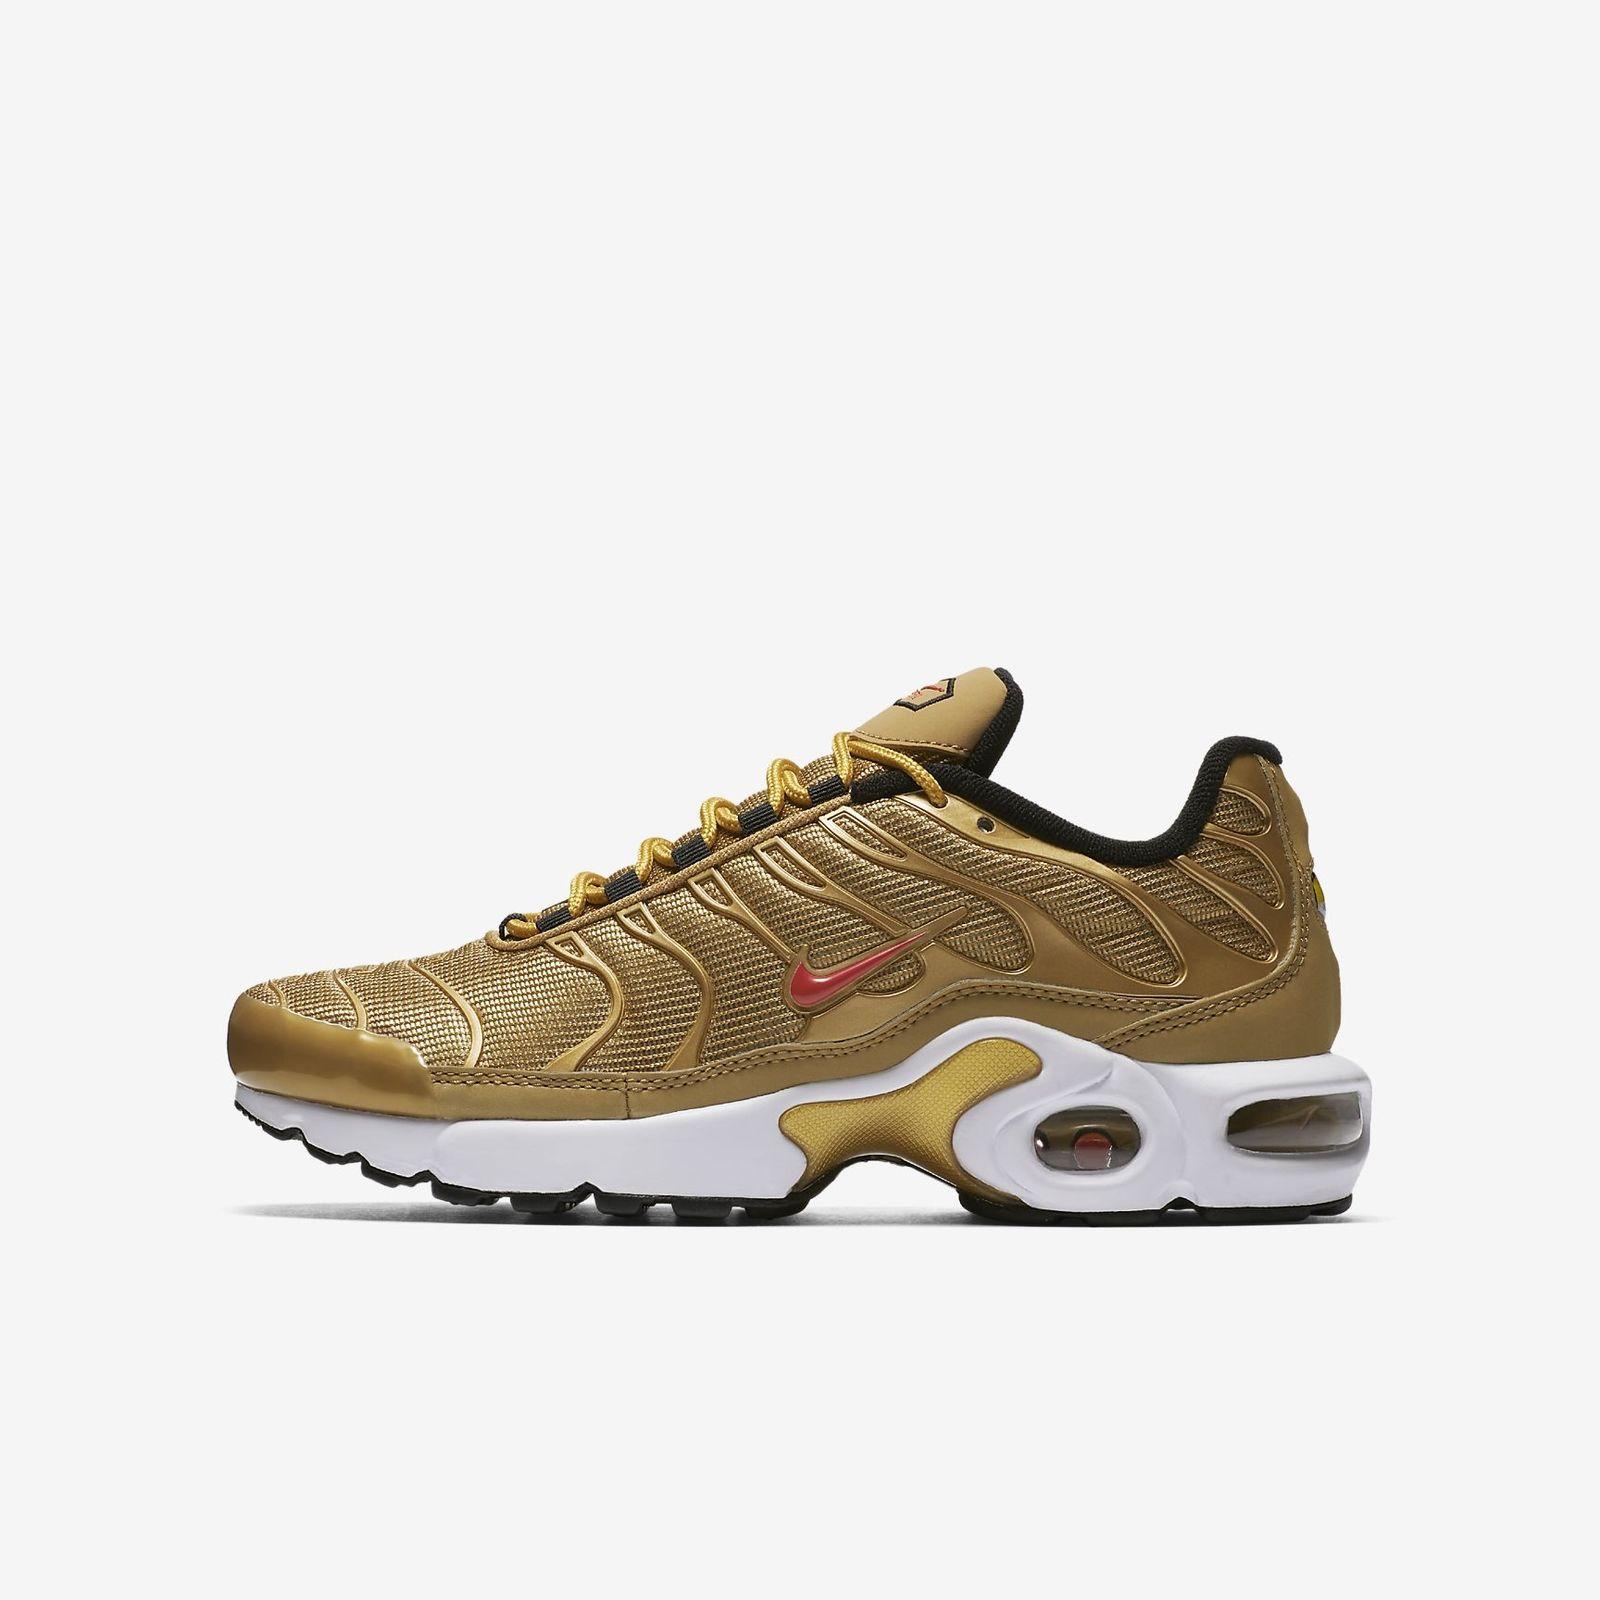 cb1e36d2eb Details about Nike AIR MAX PLUS TN SE AR0259-700 METALLIC GOLD BLACK  VARSITY RED 97